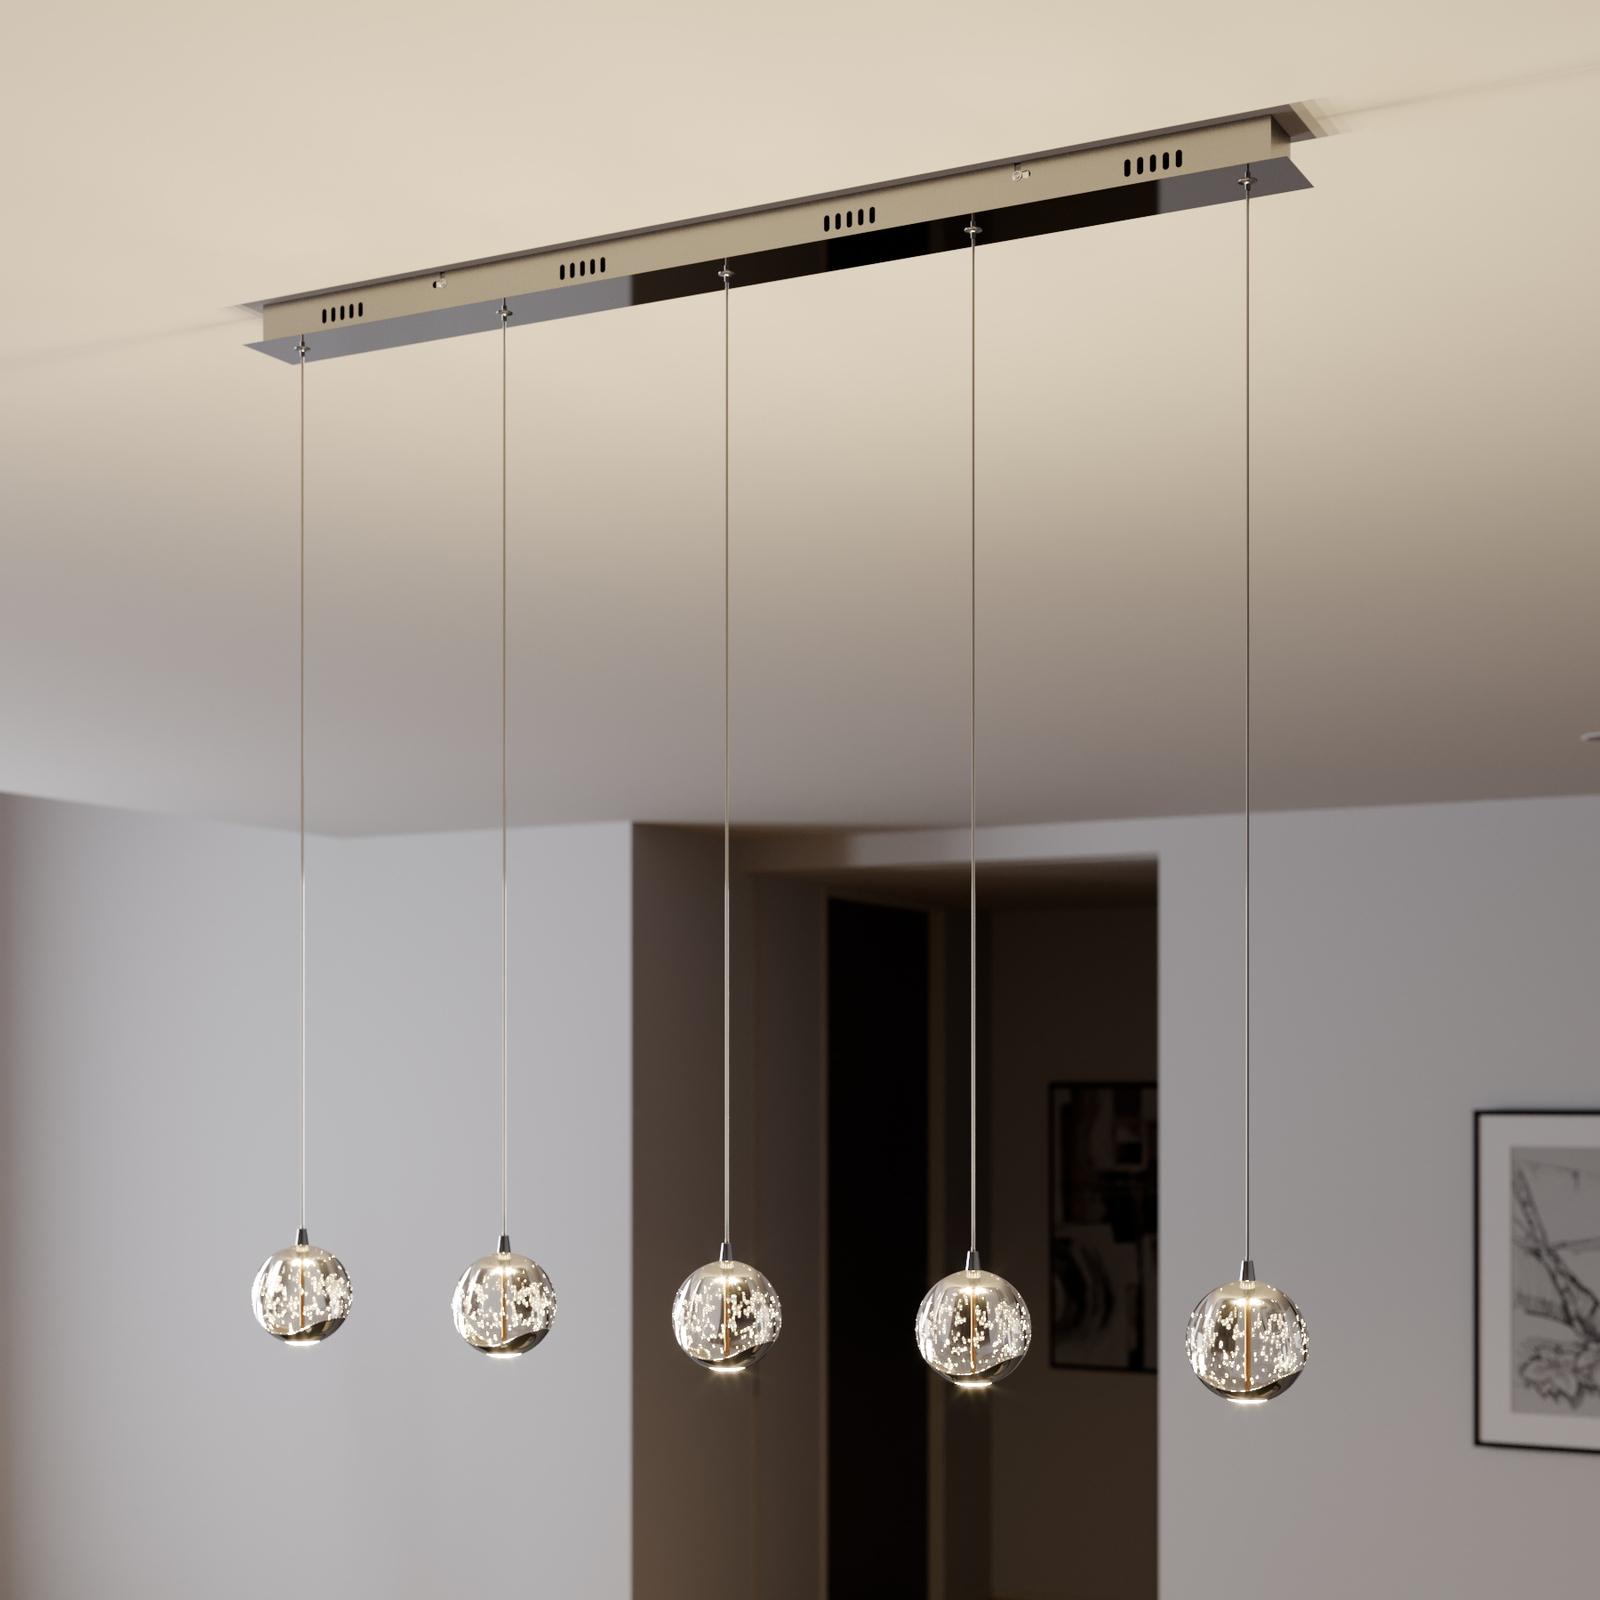 LED-Pendellampe Hayley, 5-fl., länglich, chrom